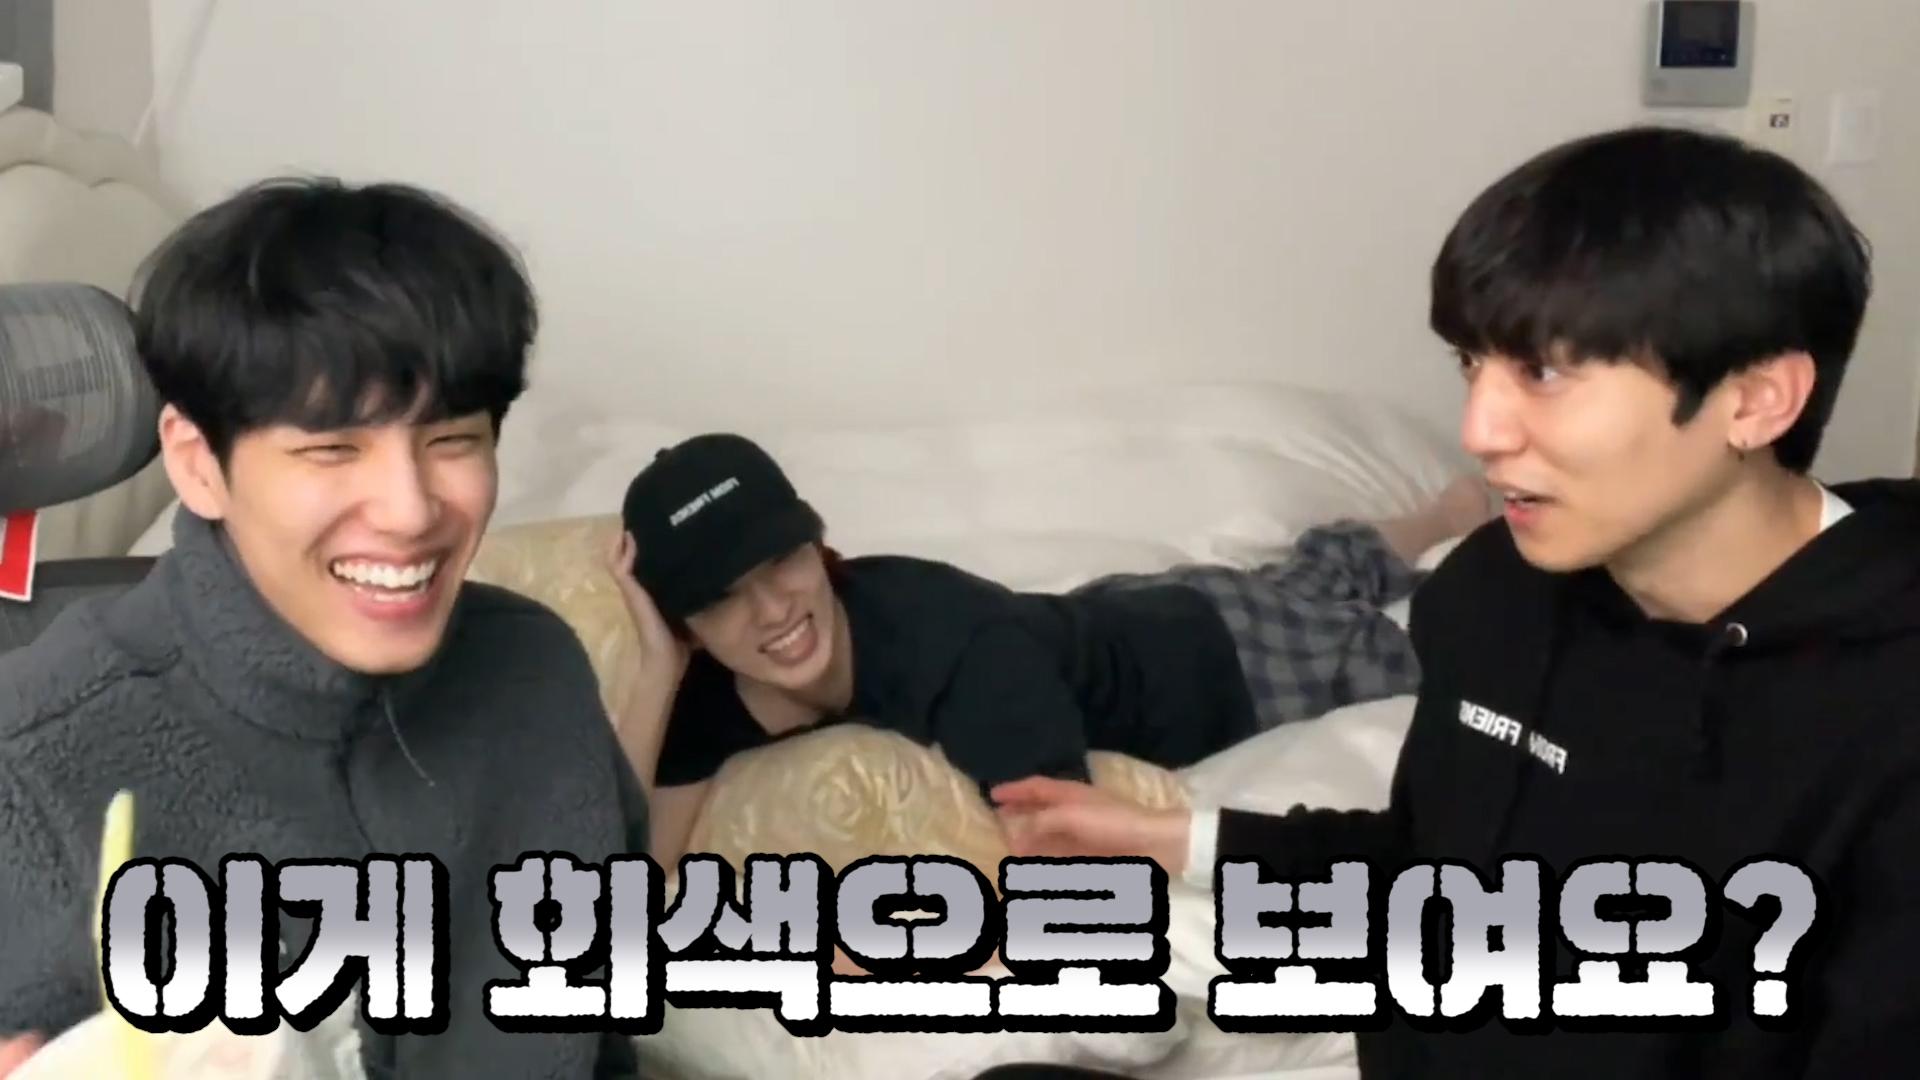 [DAY6] 완전 검은색의 깊이만큼 데이식스 사랑해..🖤 (SUNGJIN&Jae&WONPIL's spoiler V)